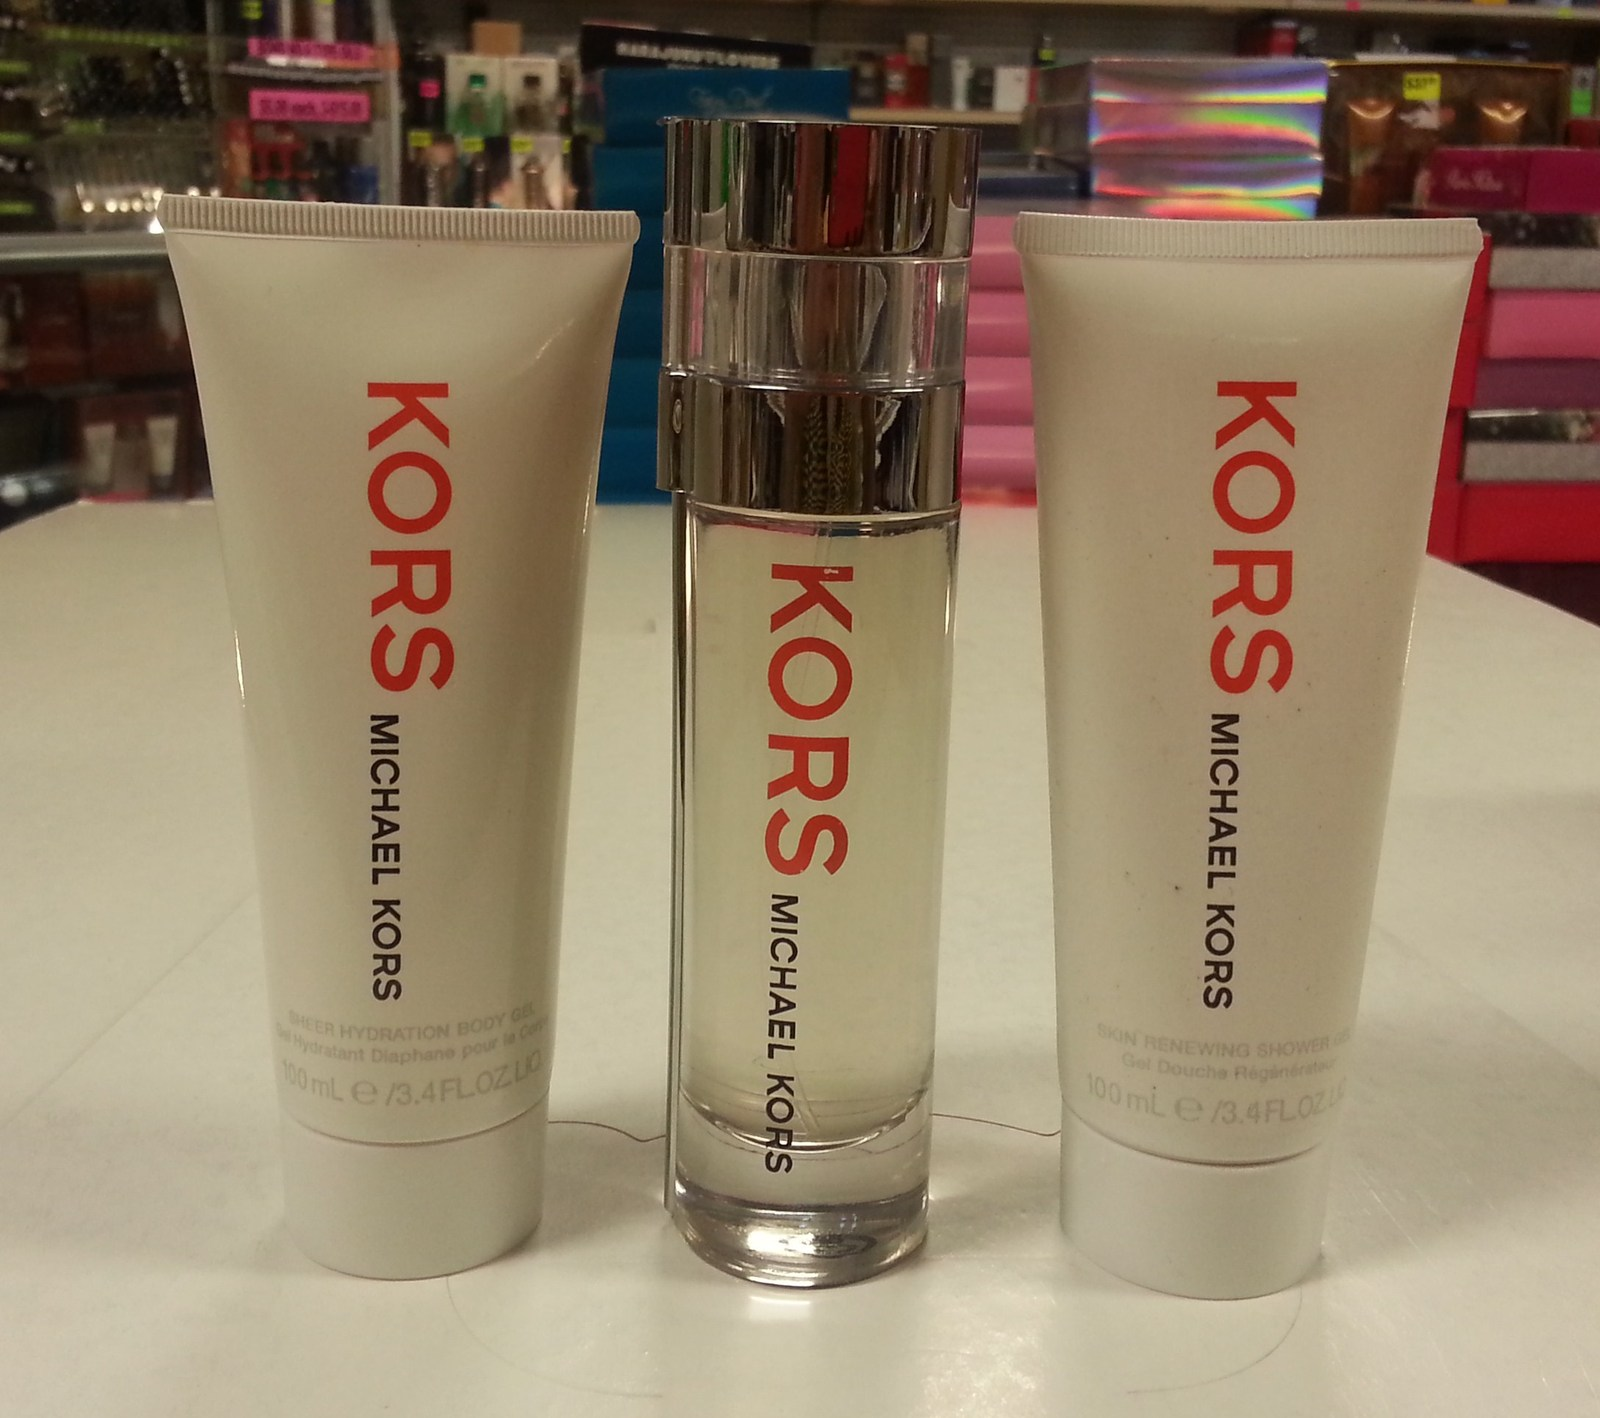 Kors by Michael Kors 3PCs Women Set, 1.7 oz + 3.4 Body Gel + Shower Gel, Rare